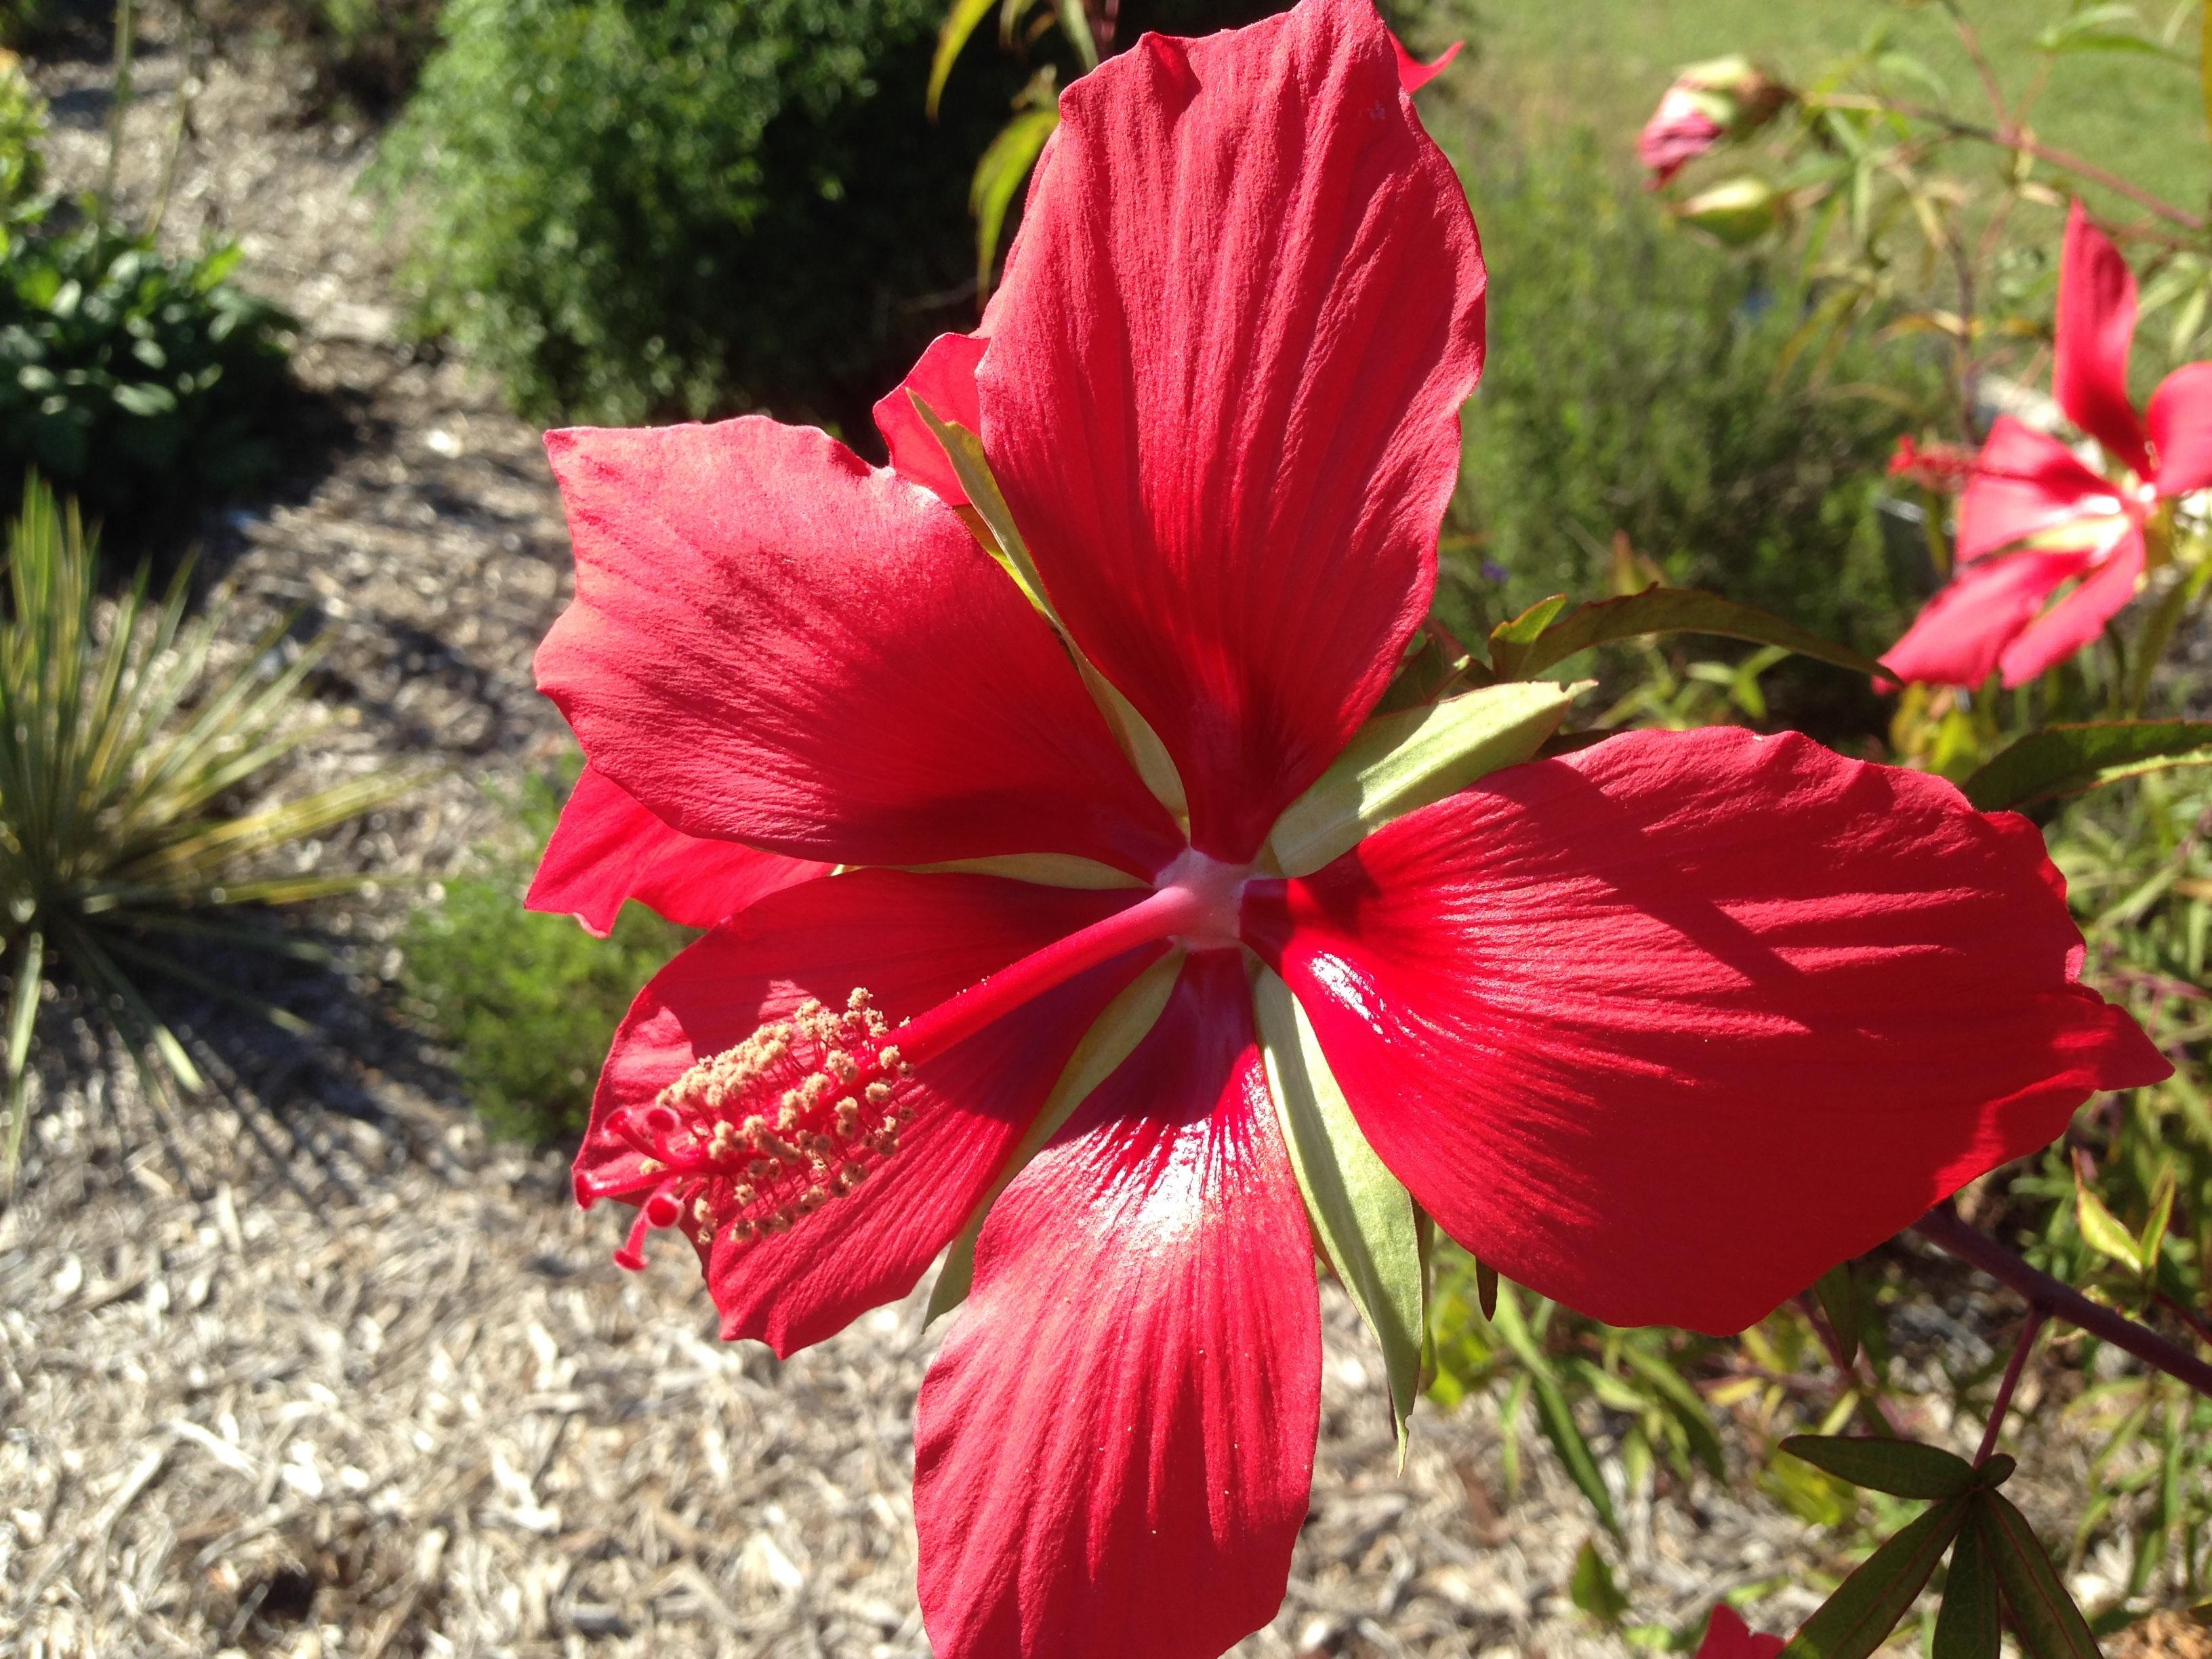 Free Images Flower Petal Bloom Red Botany Flora Flowering